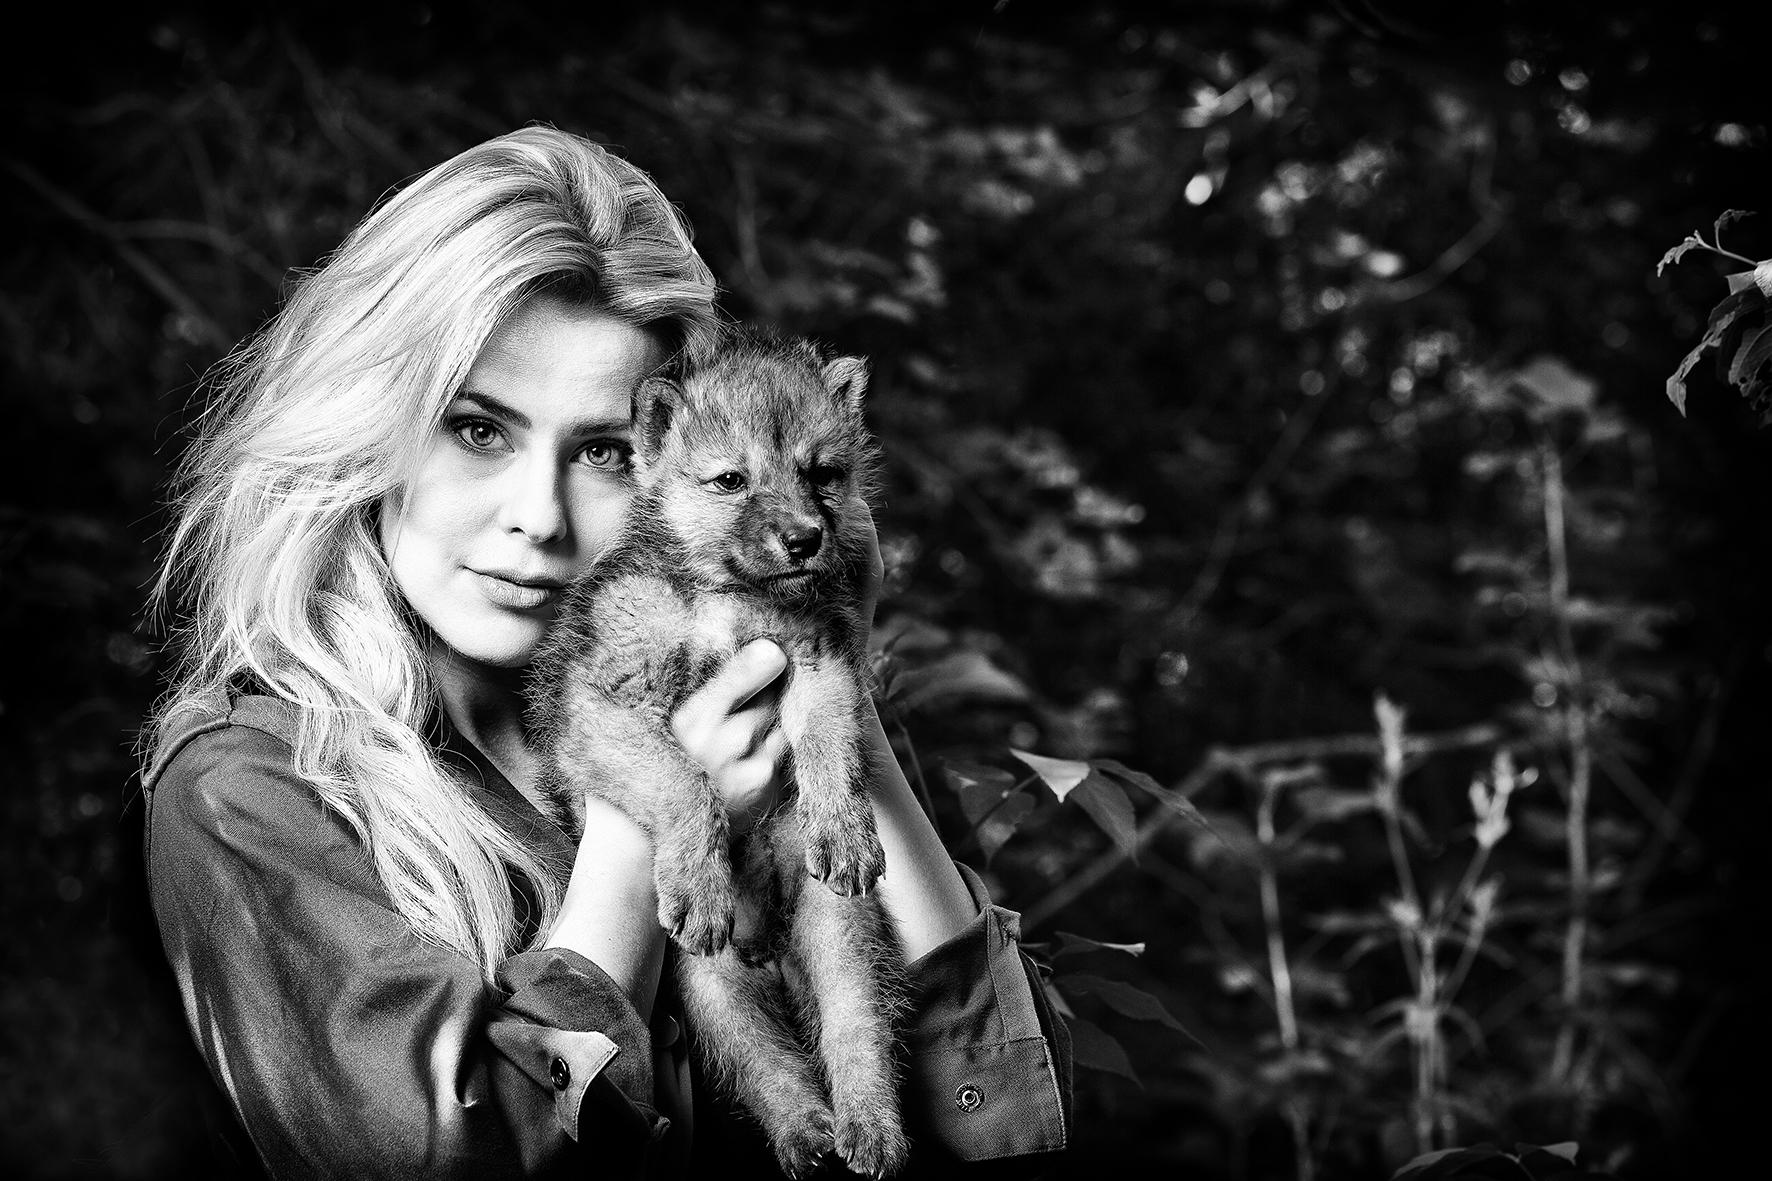 Dutch presentarice Celine Huijsmans with a rare Hudson Bay wolf cub. Visagie Eline van Zwol Assistant Tim van der Made Thanks to DoeZoo Leens and Park Oikos